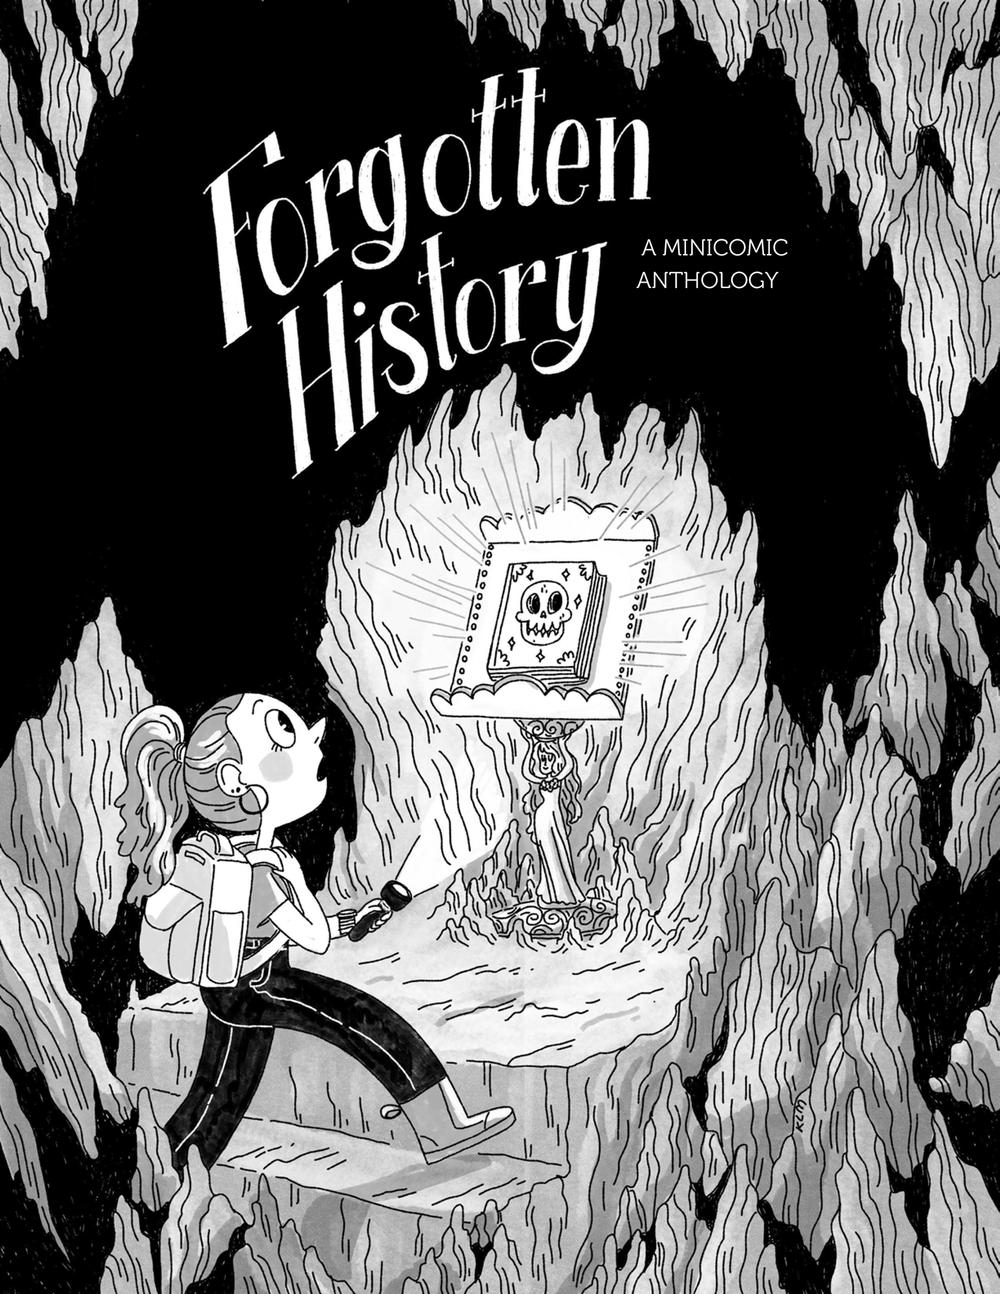 Forgotten-History---A-Minicomics-Anthology---Kickstarter-PDF-1.png